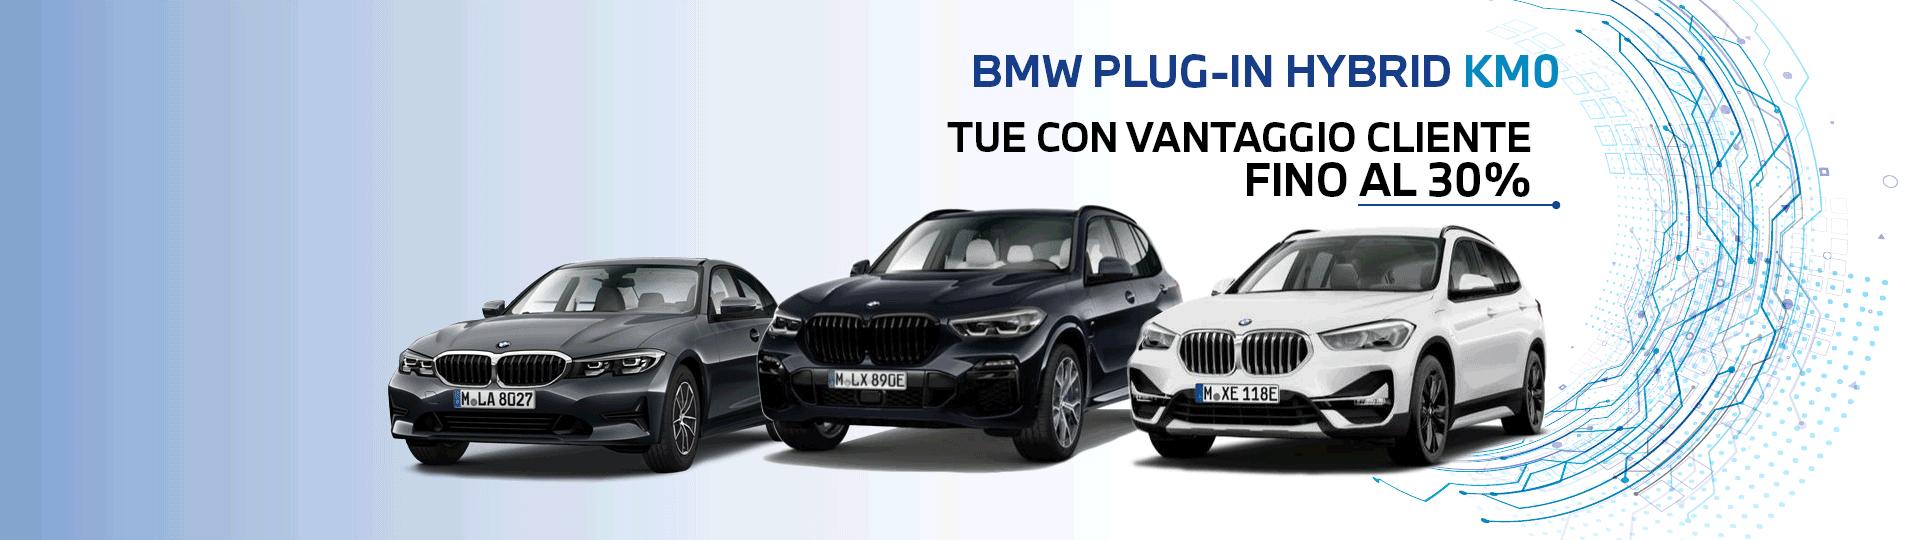 BMW-KM0_sito-min2.png